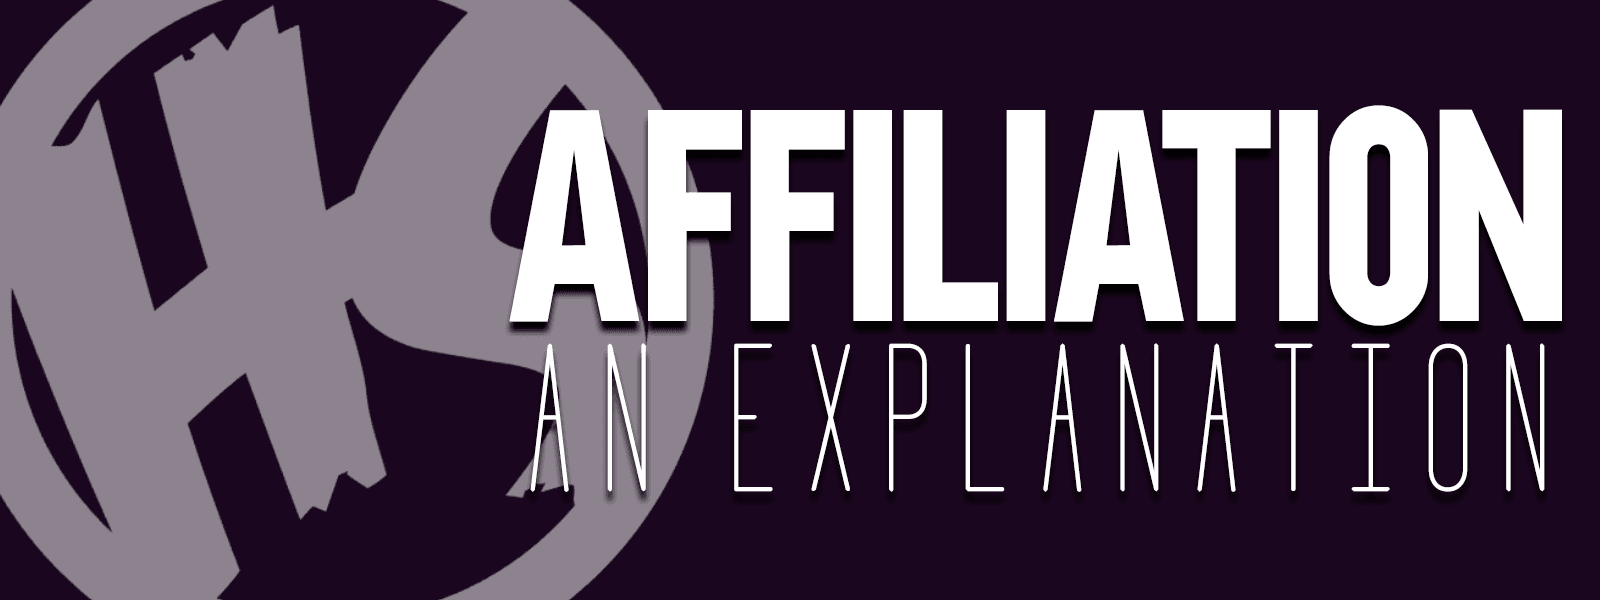 Affiliation Featured Image